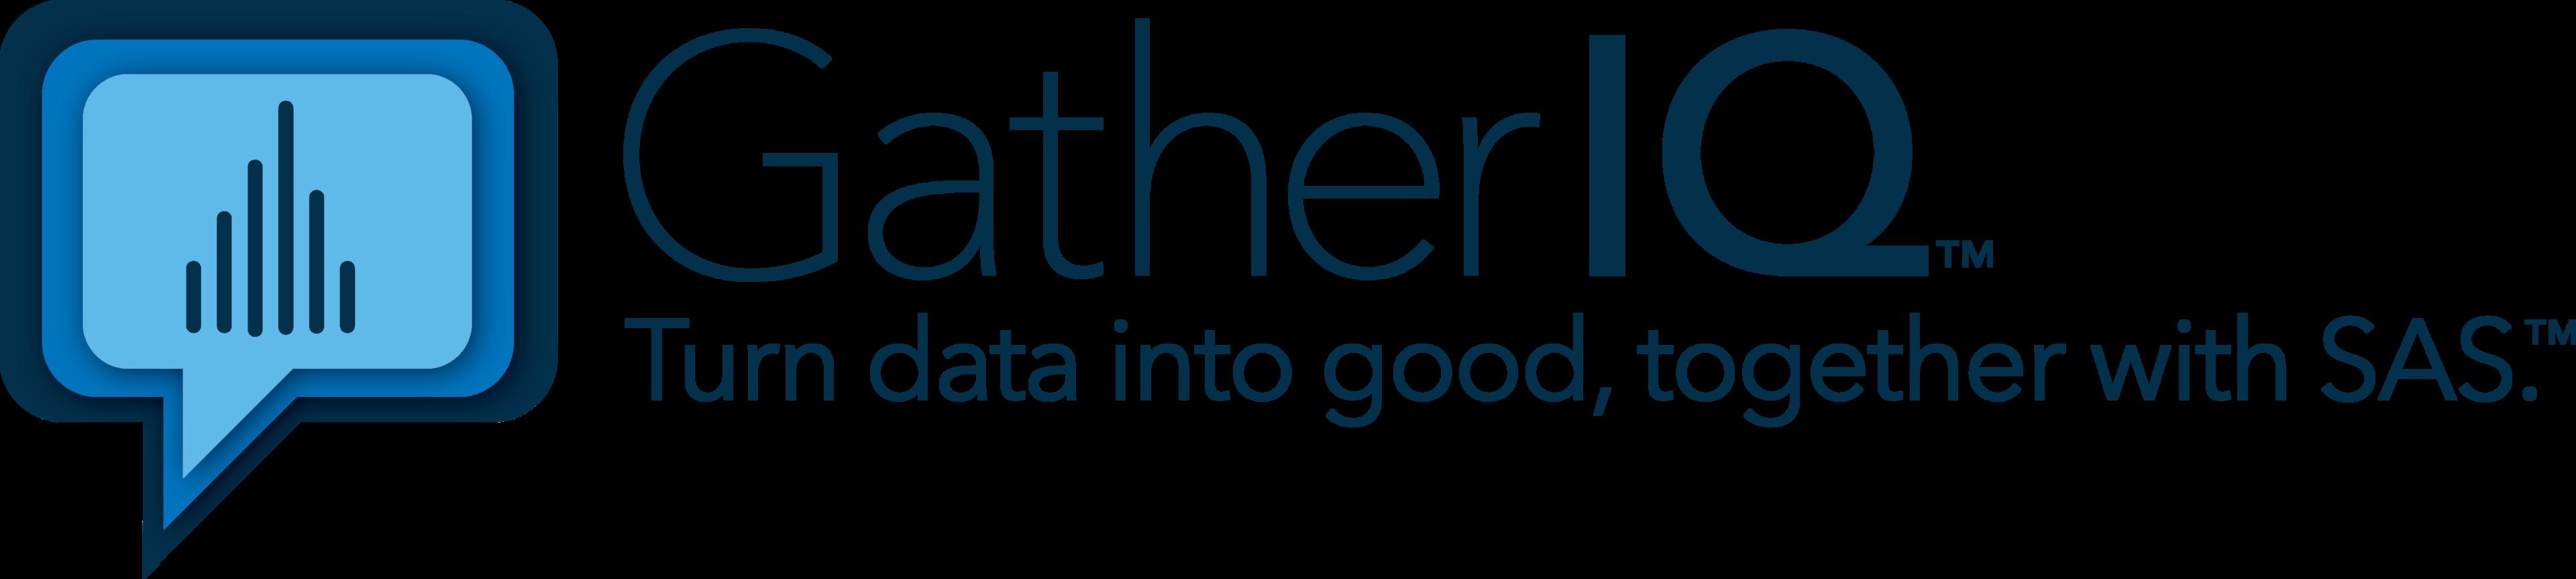 GatherIQ Turn Data Into Good, Together With SAS logo